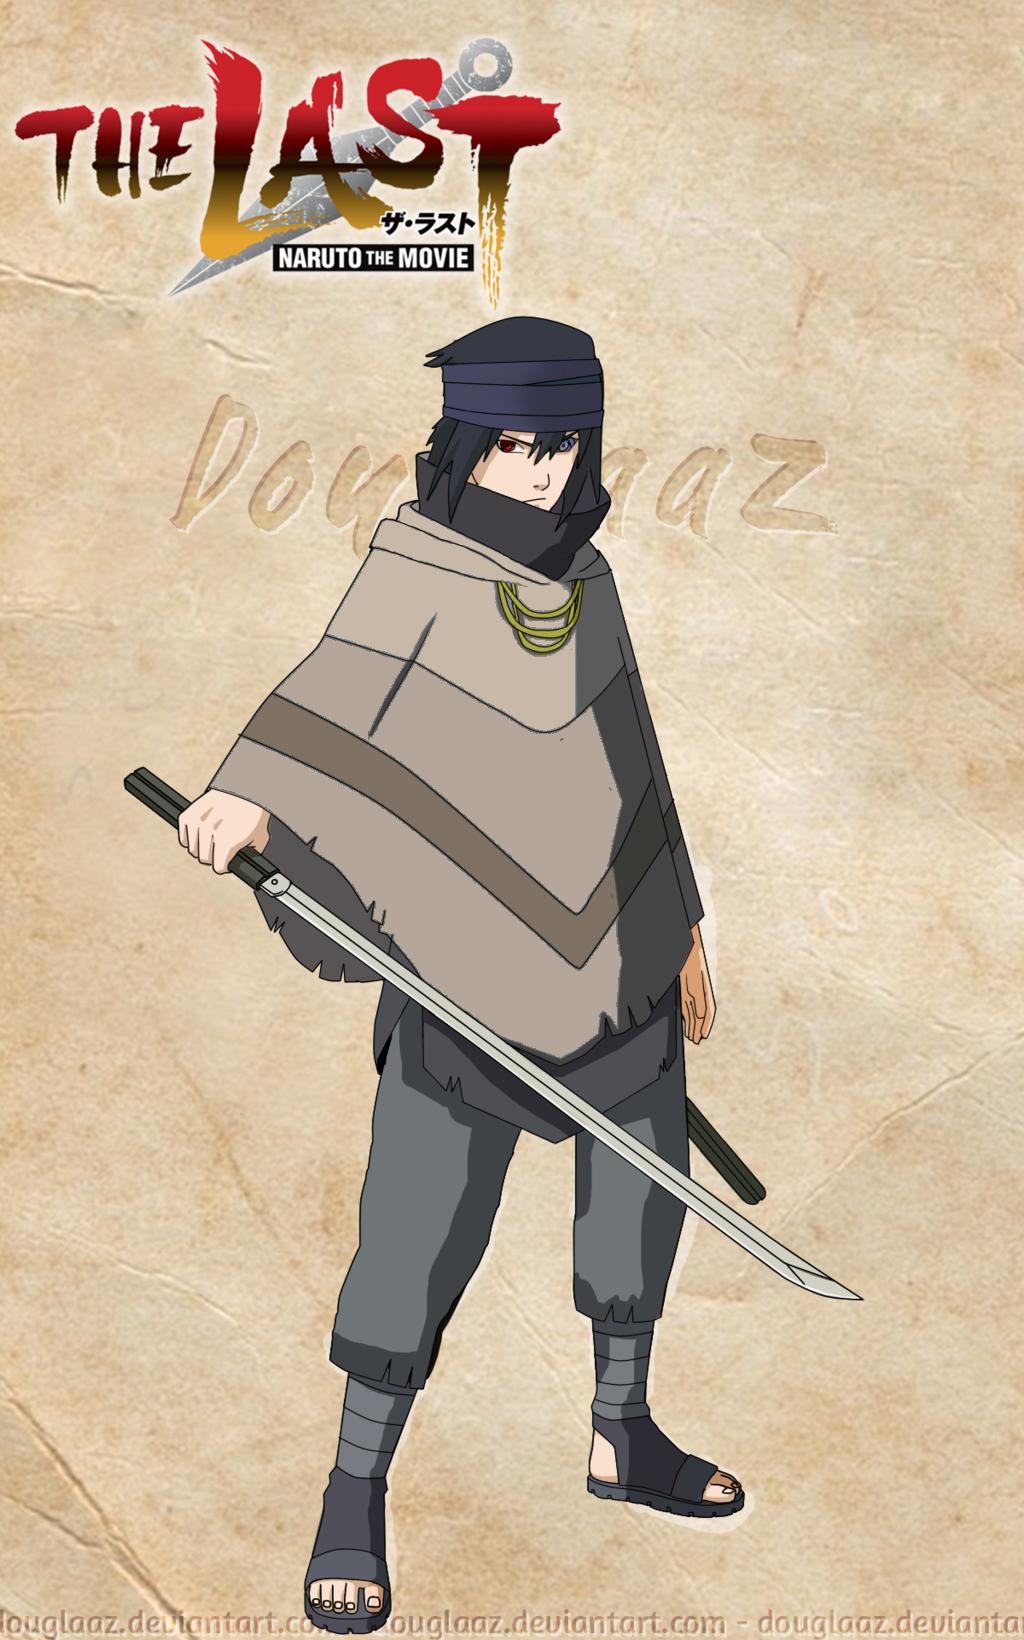 image sasuke the last naruto the movie by douglaaz d84fwrj png